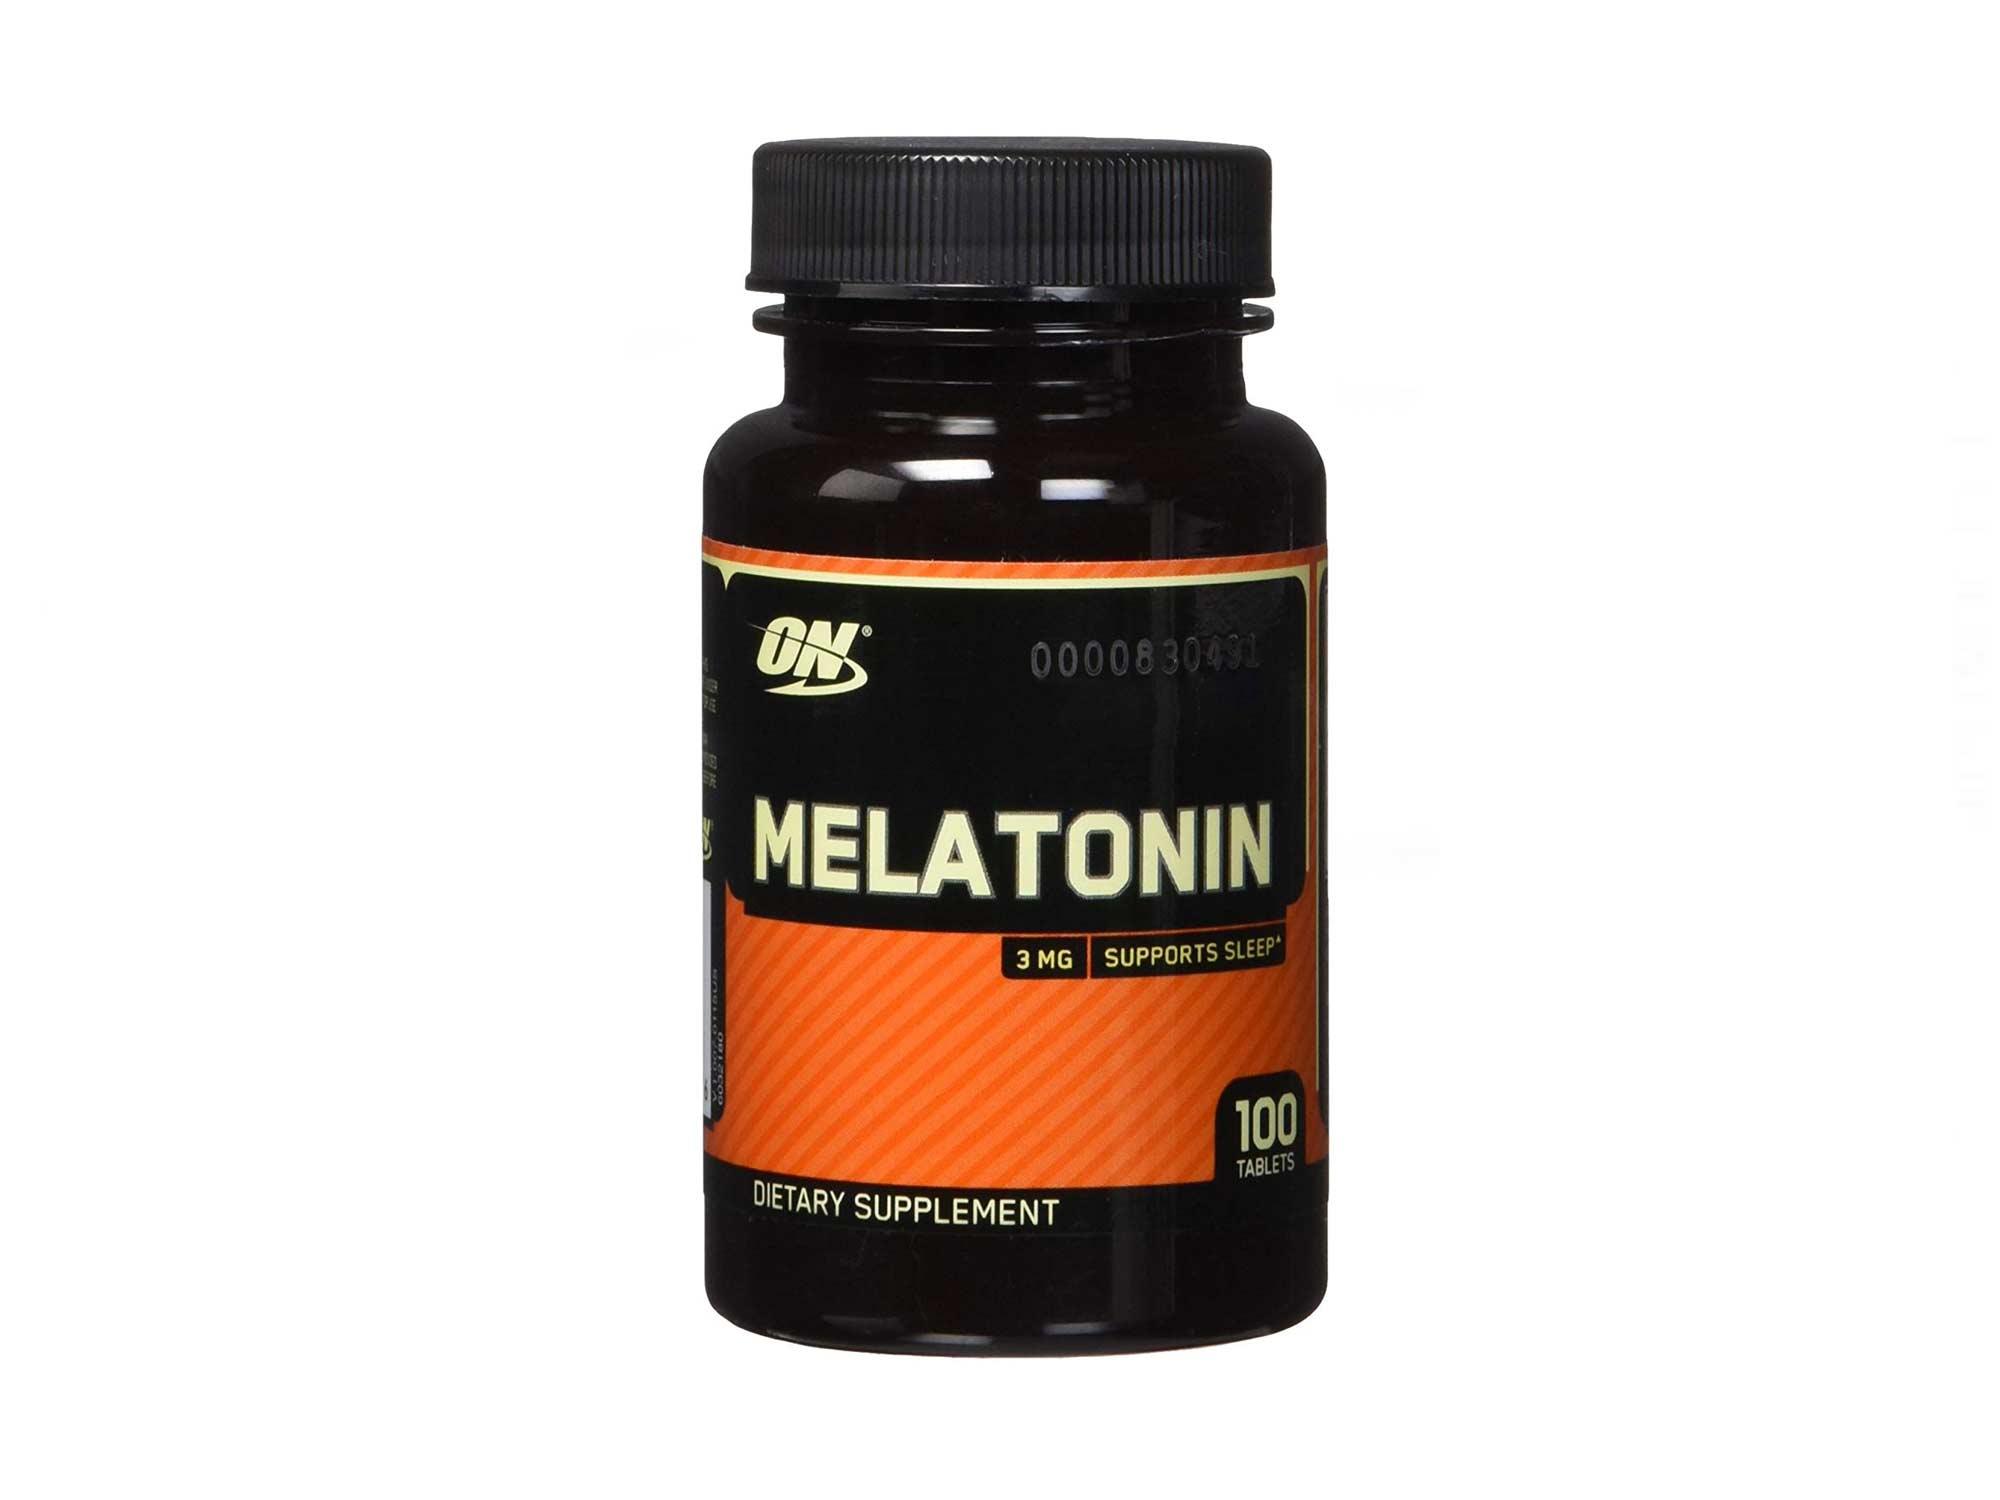 Optimum Nutrition Melatonin 100 таб | Мелатонин 100 таб 3мг